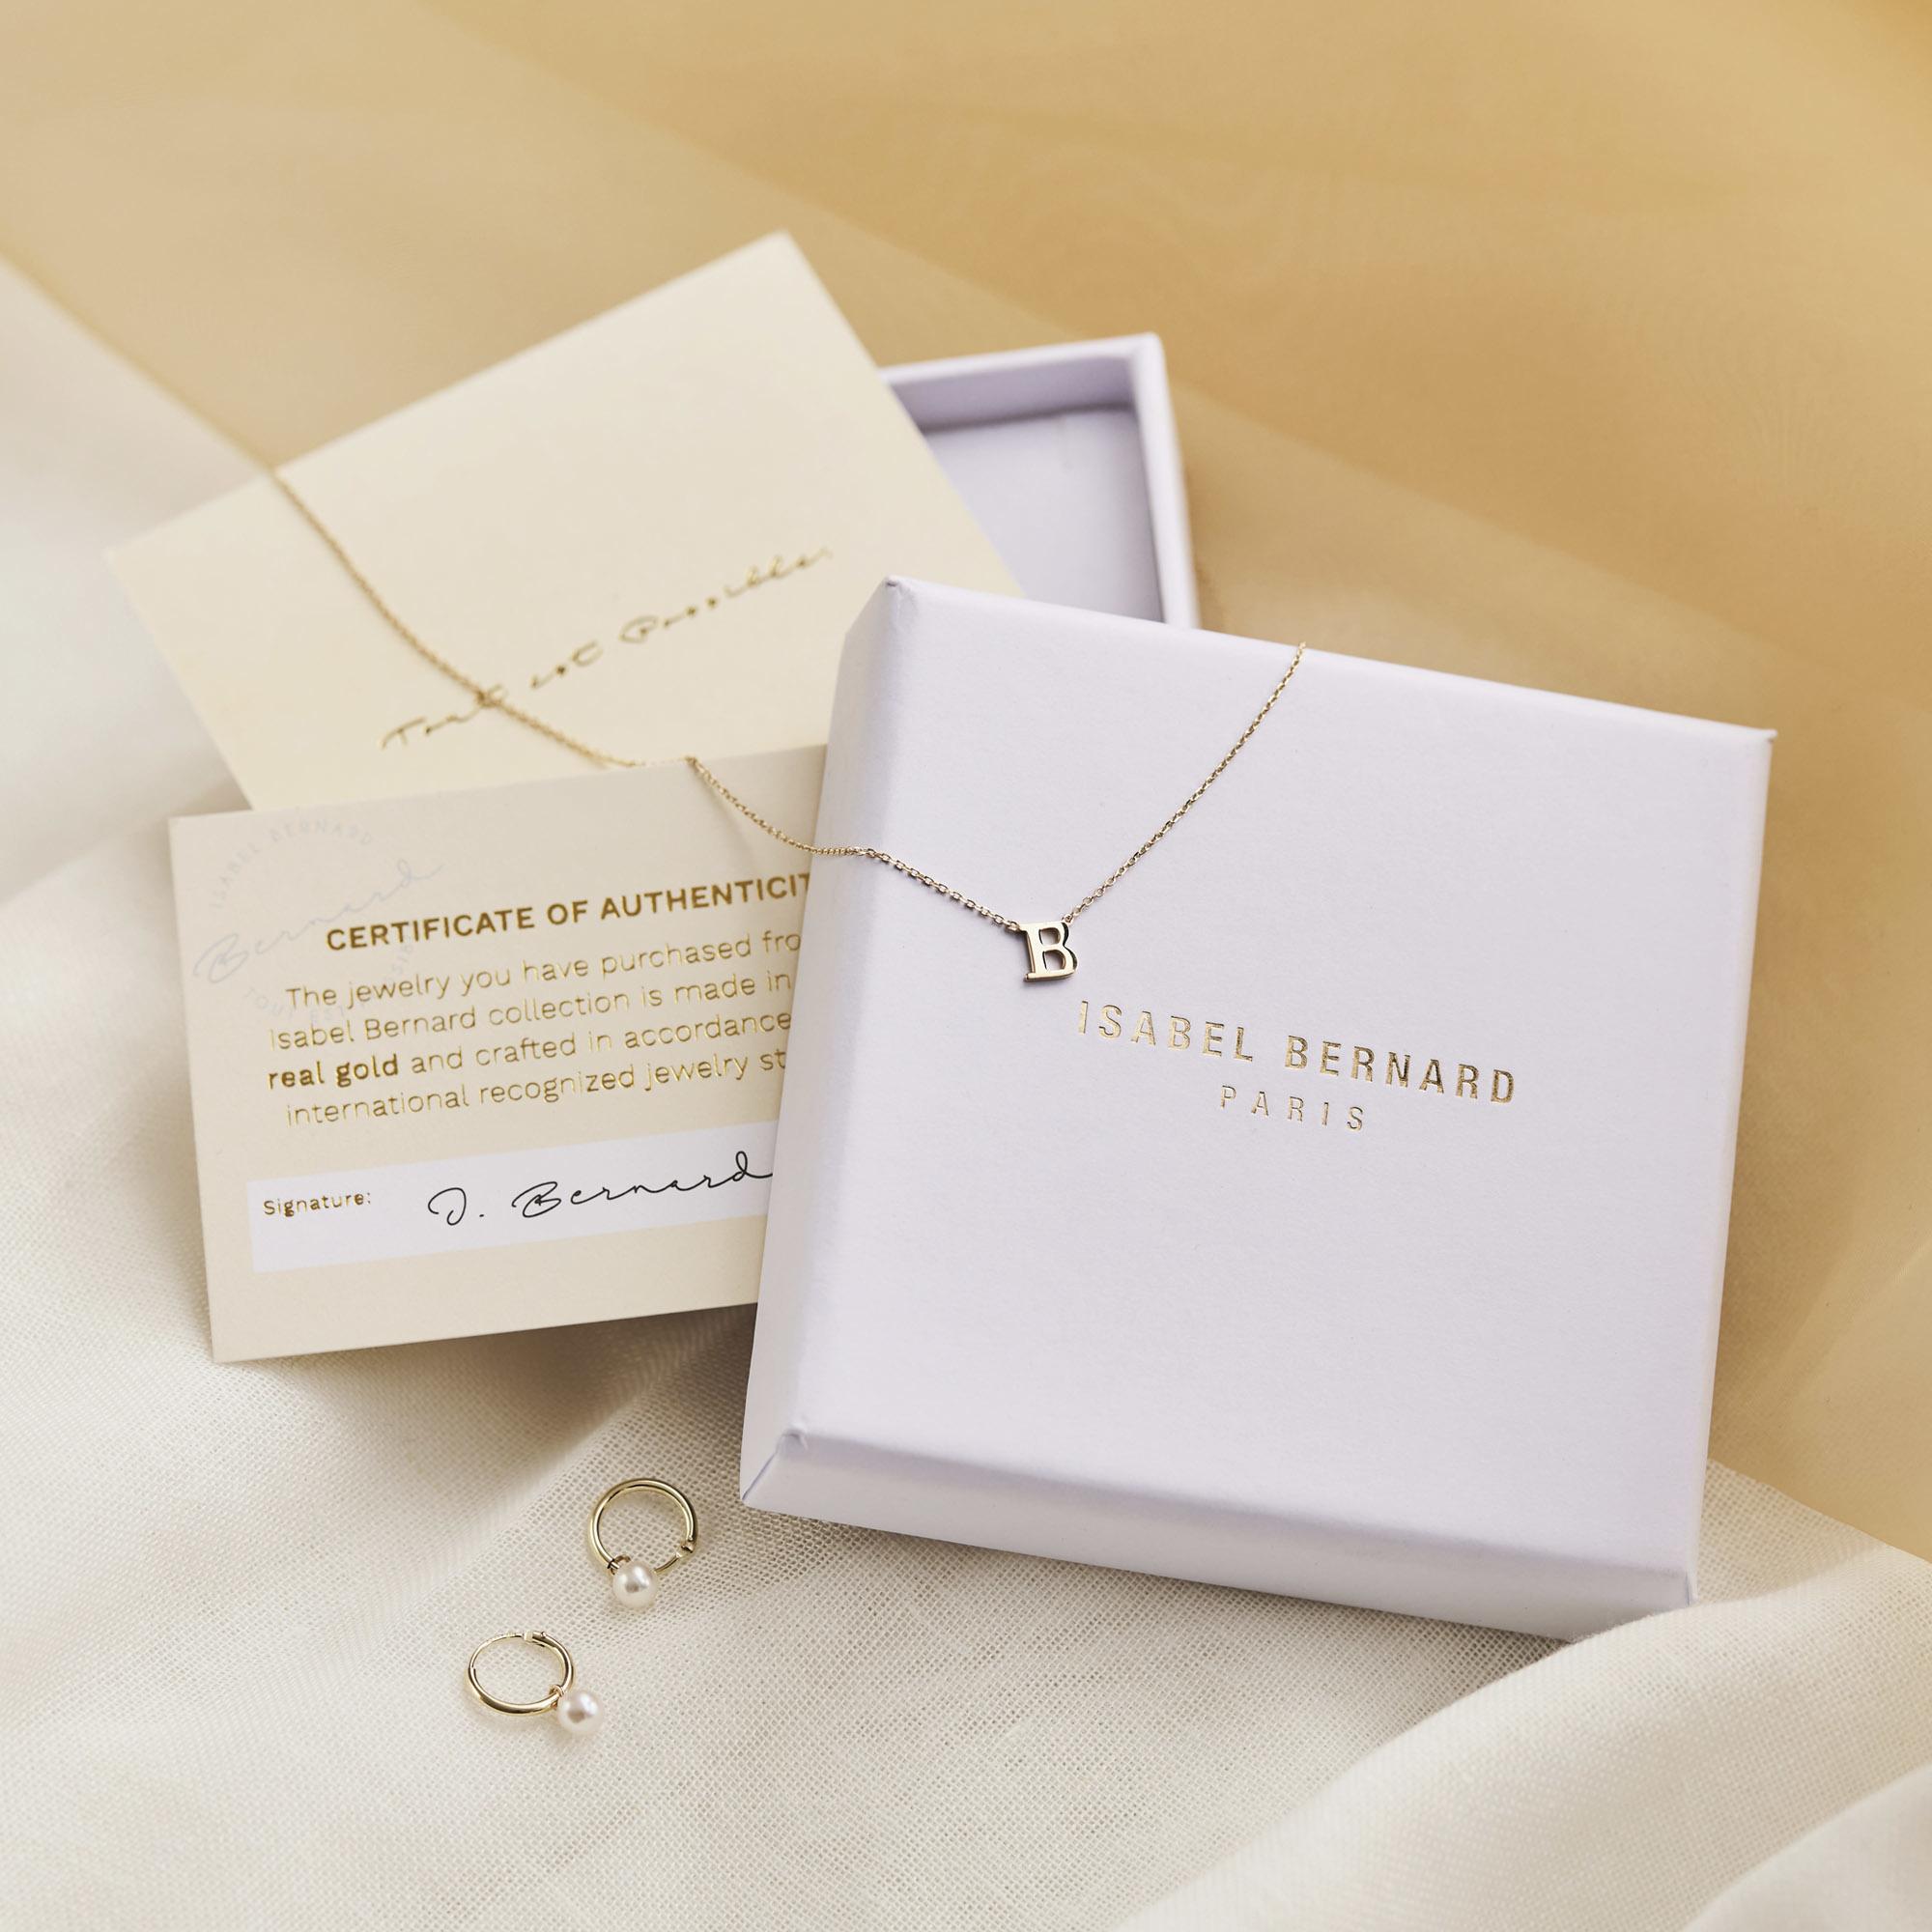 Isabel Bernard Le Marais Eloise 14 karat gold necklace with rods